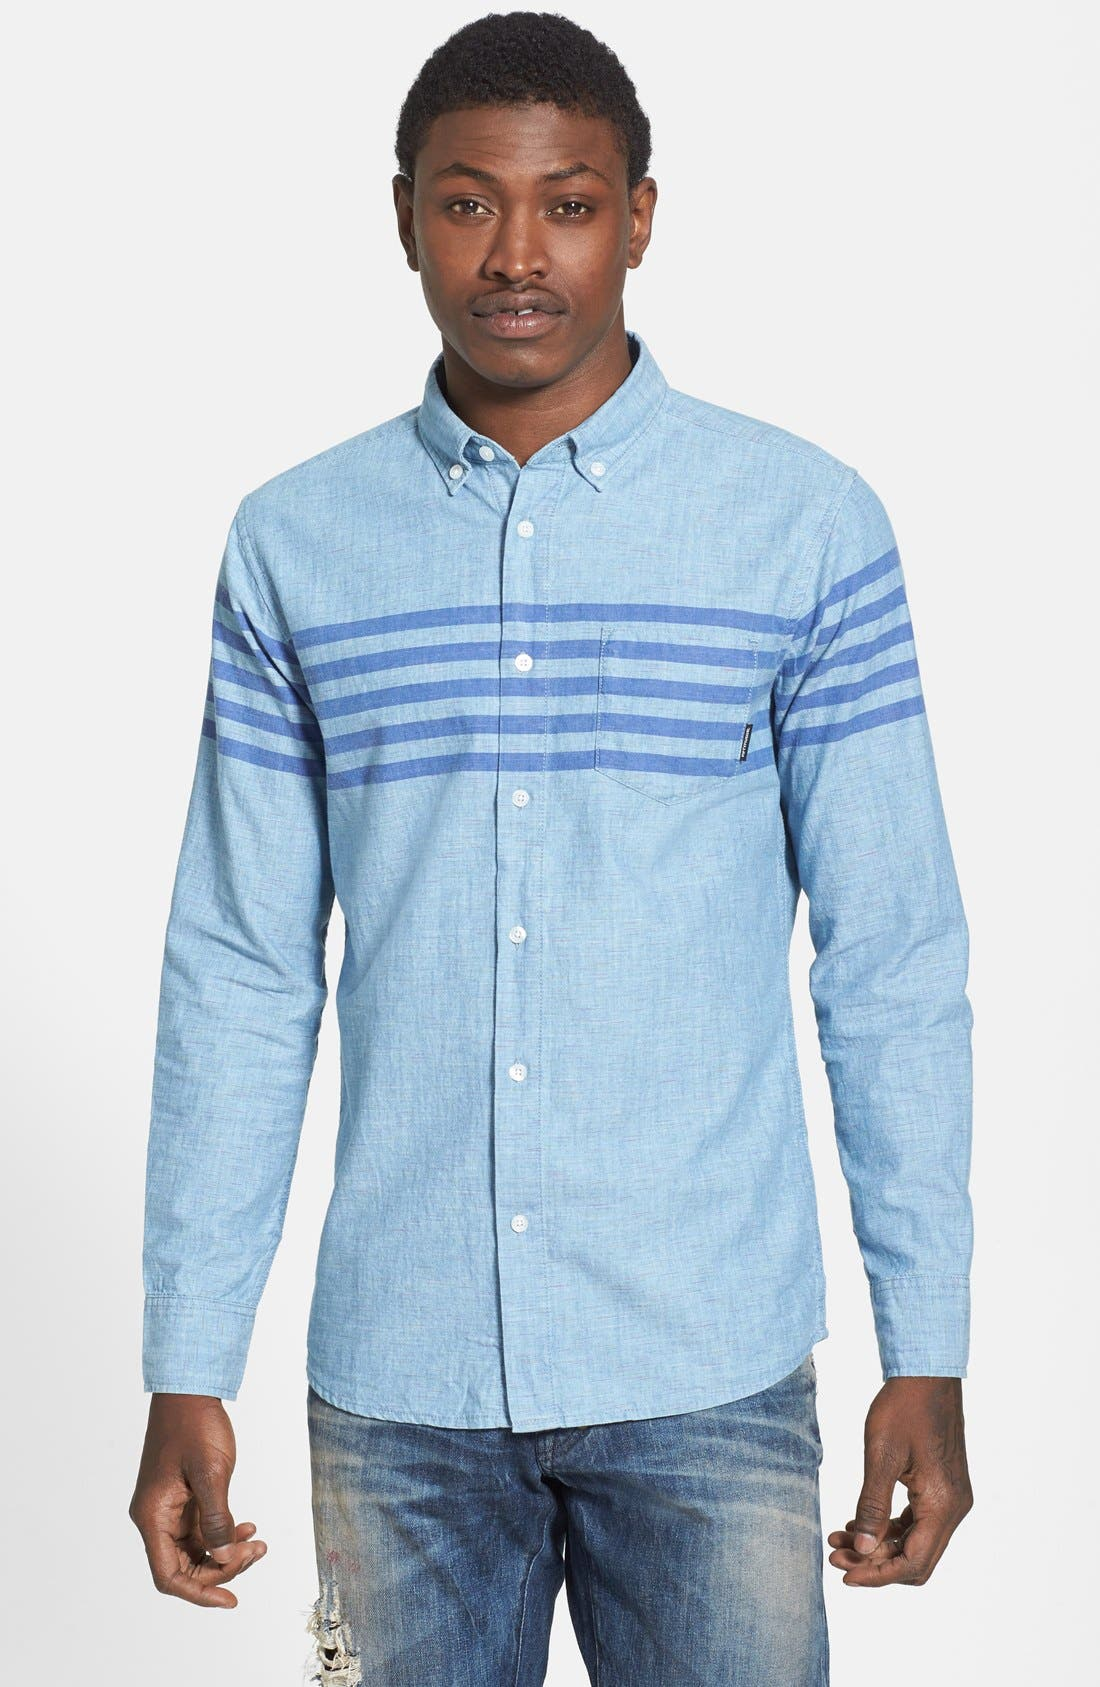 55DSL 'Stendard 55' Chest Stripe Print Woven Shirt, Main, color, 400